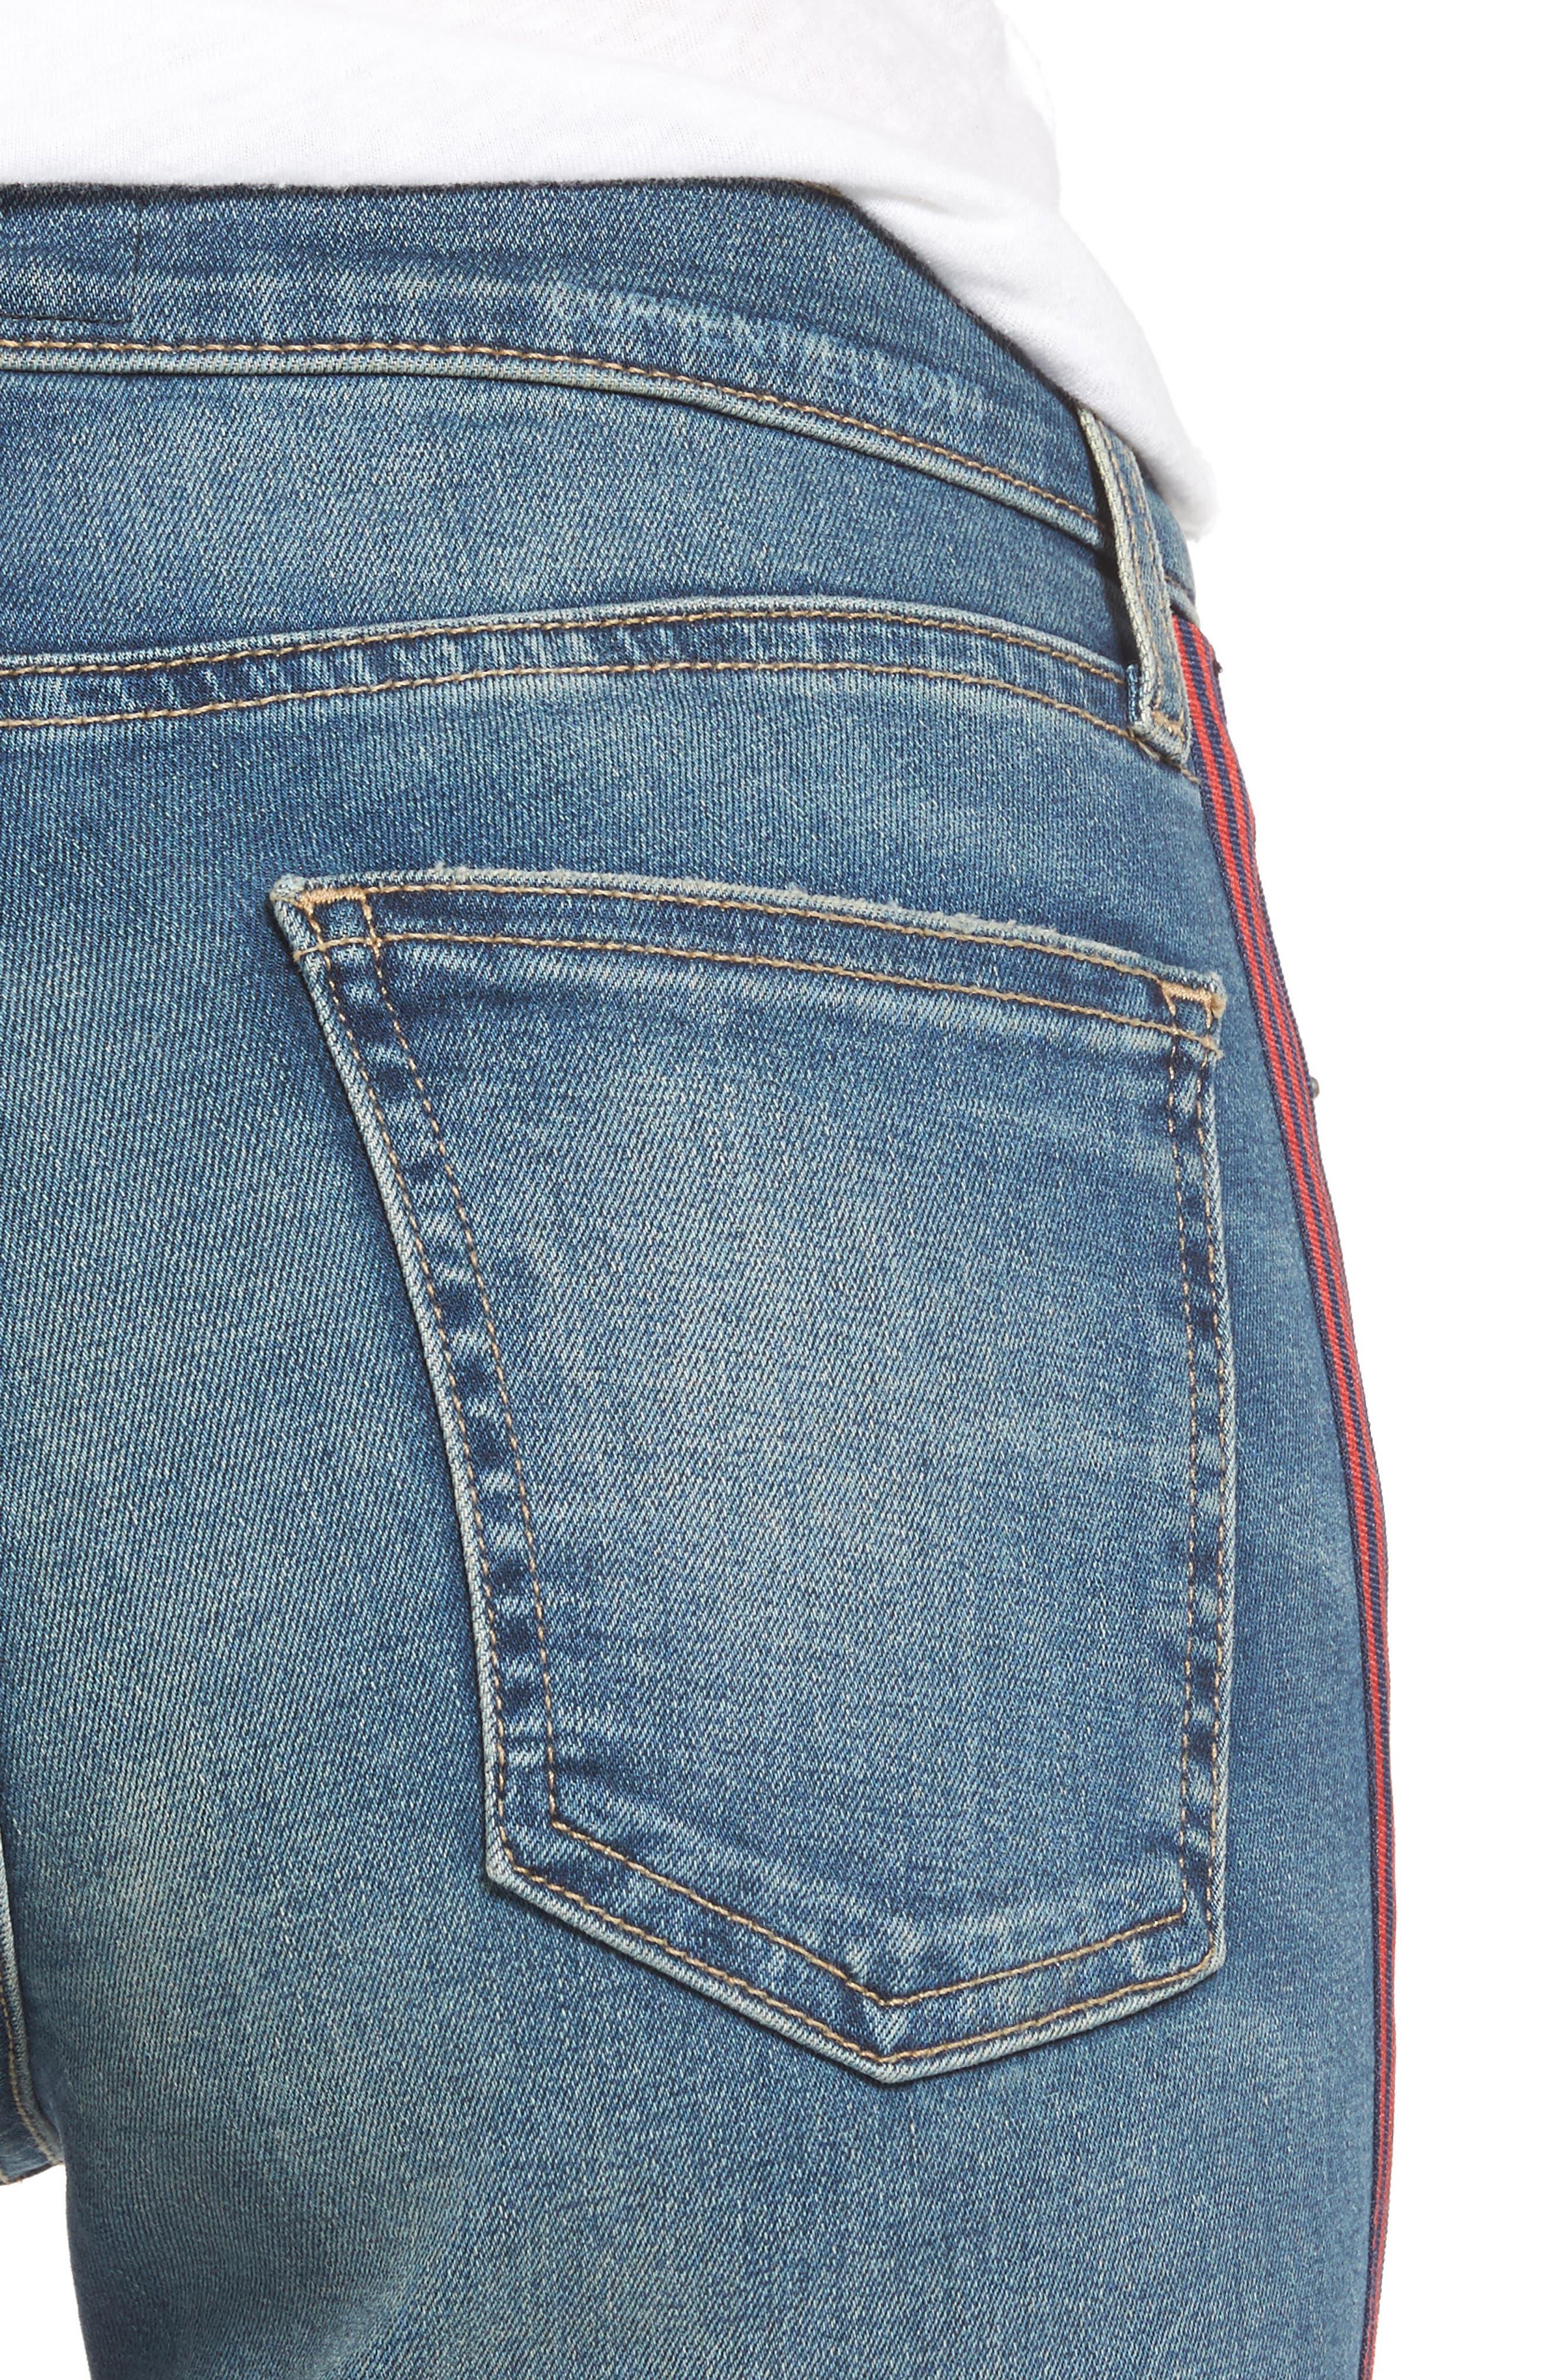 Alternate Image 4  - Current/Elliott The High Waist Stiletto Ankle Skinny Jeans (Powell/Applied Stripe)